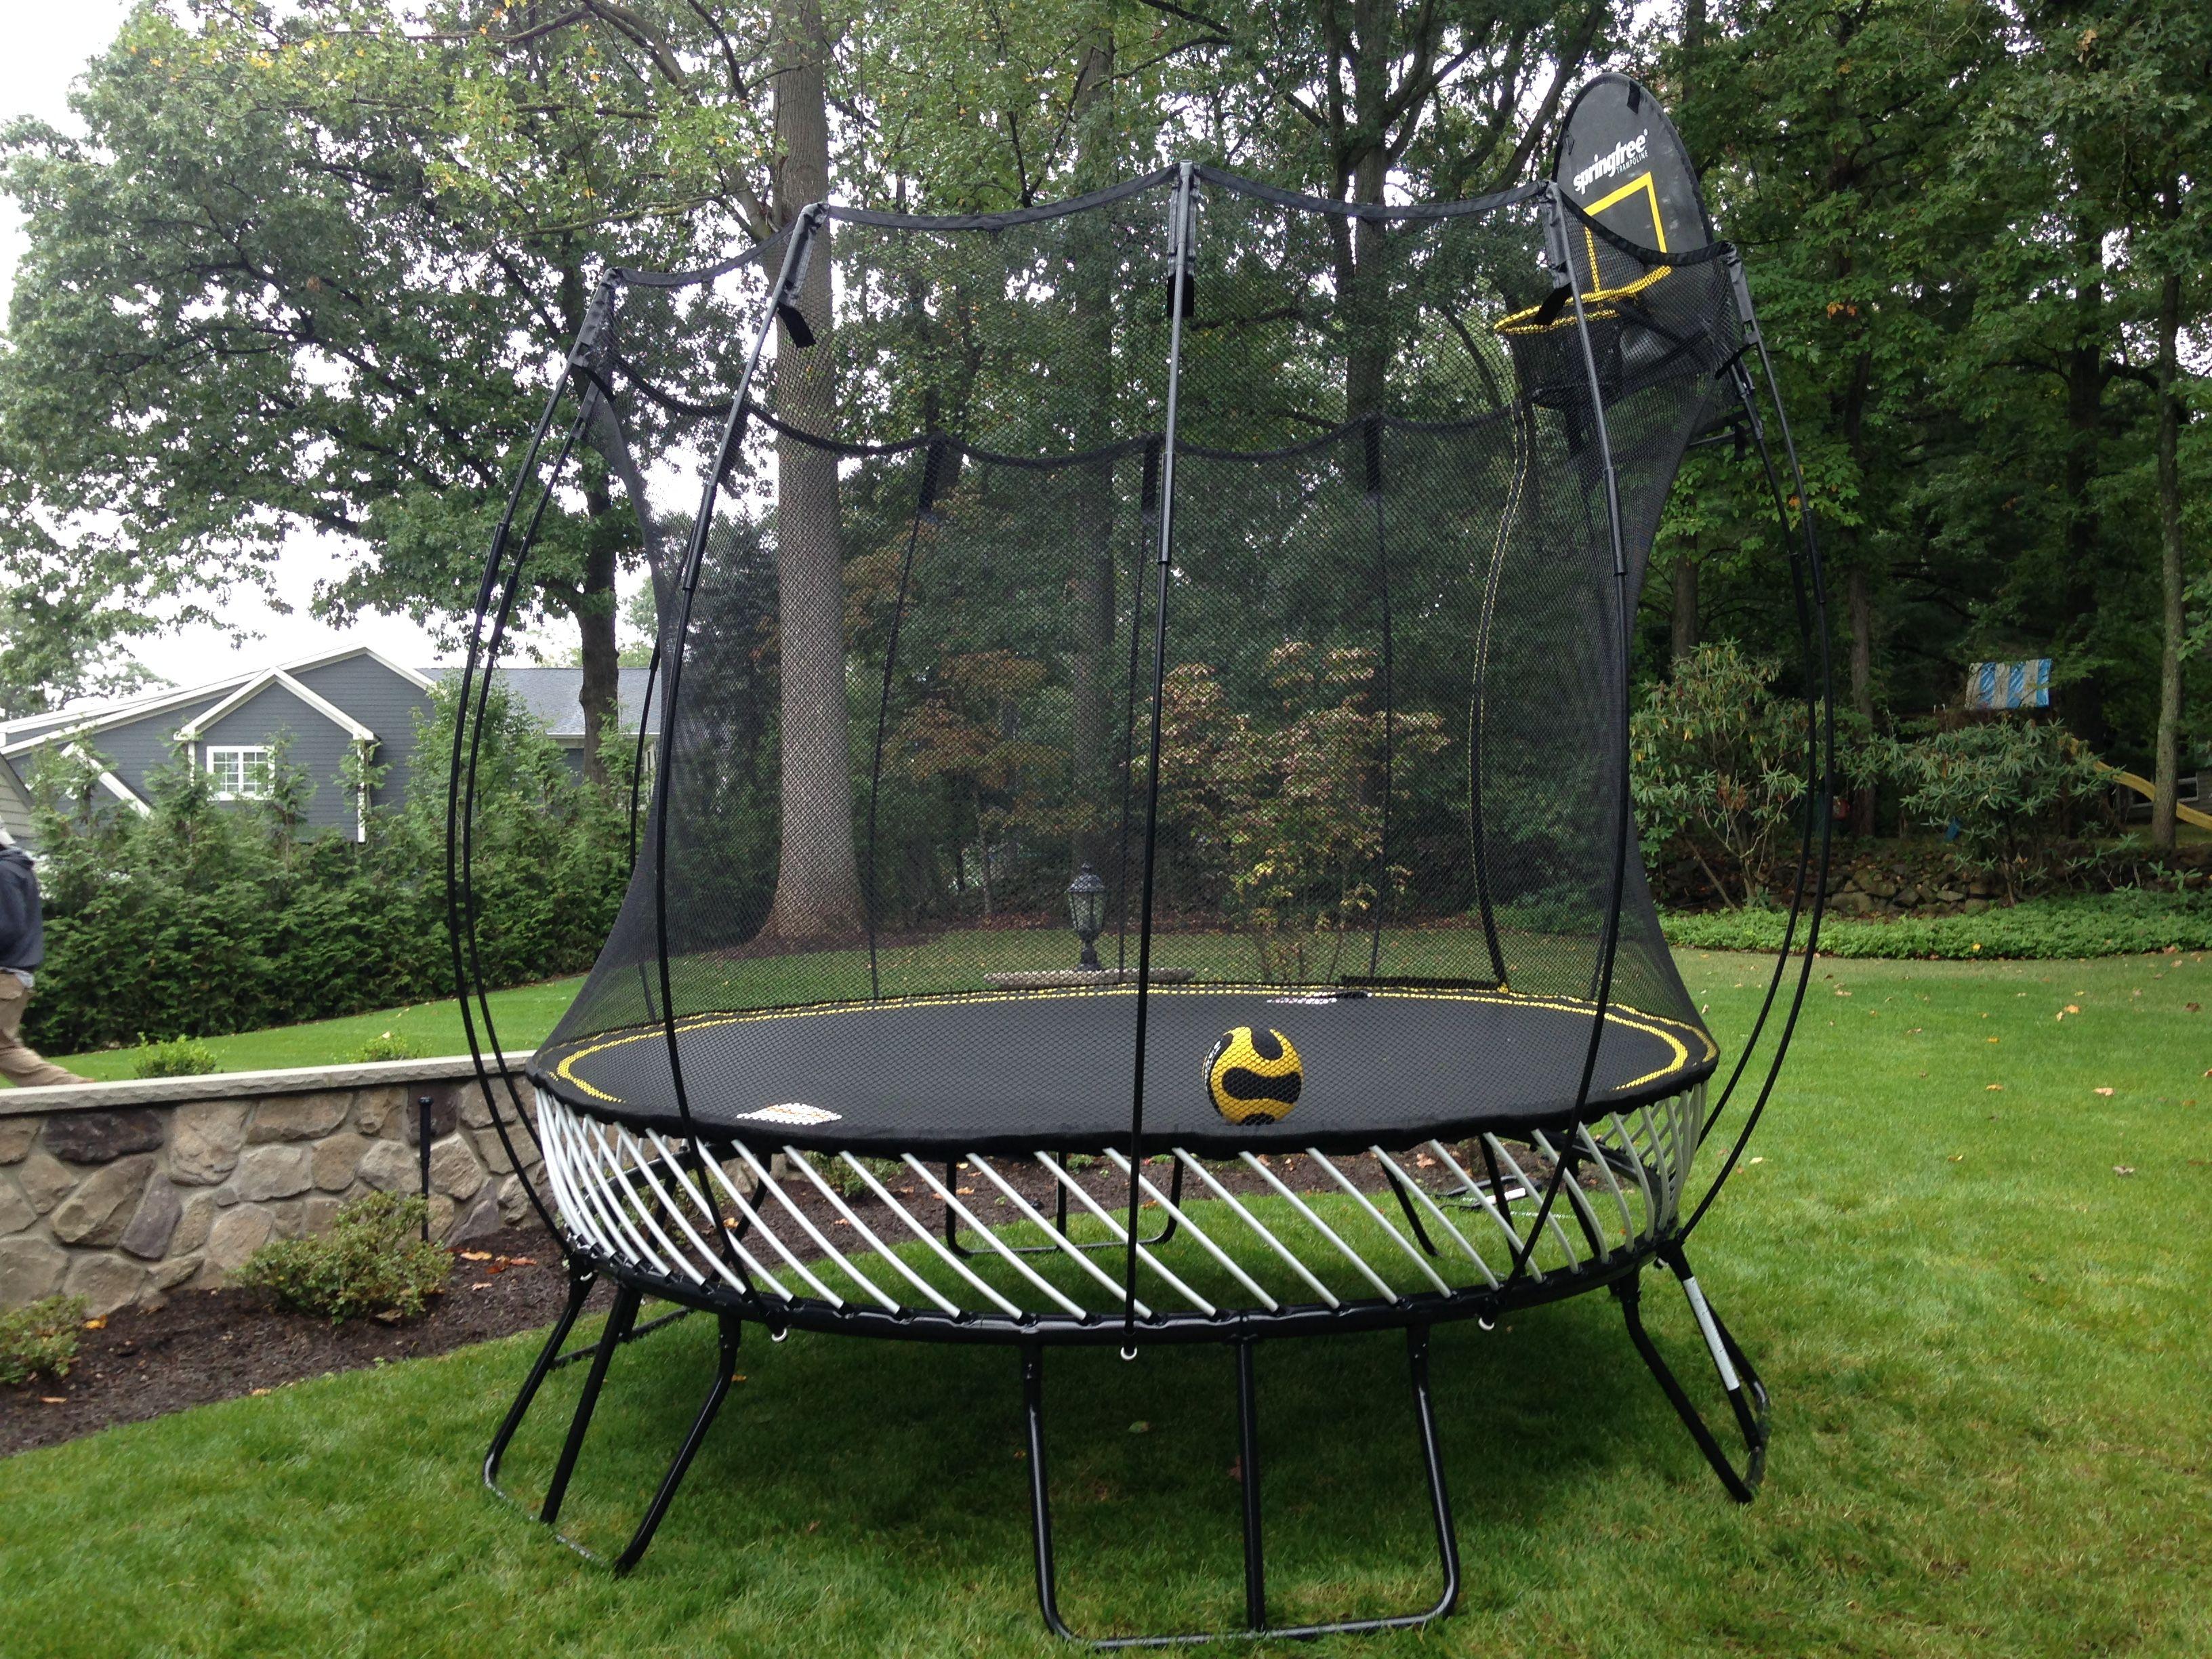 Springfree Trampoline 10 ft Round. | Backyard trampoline ...